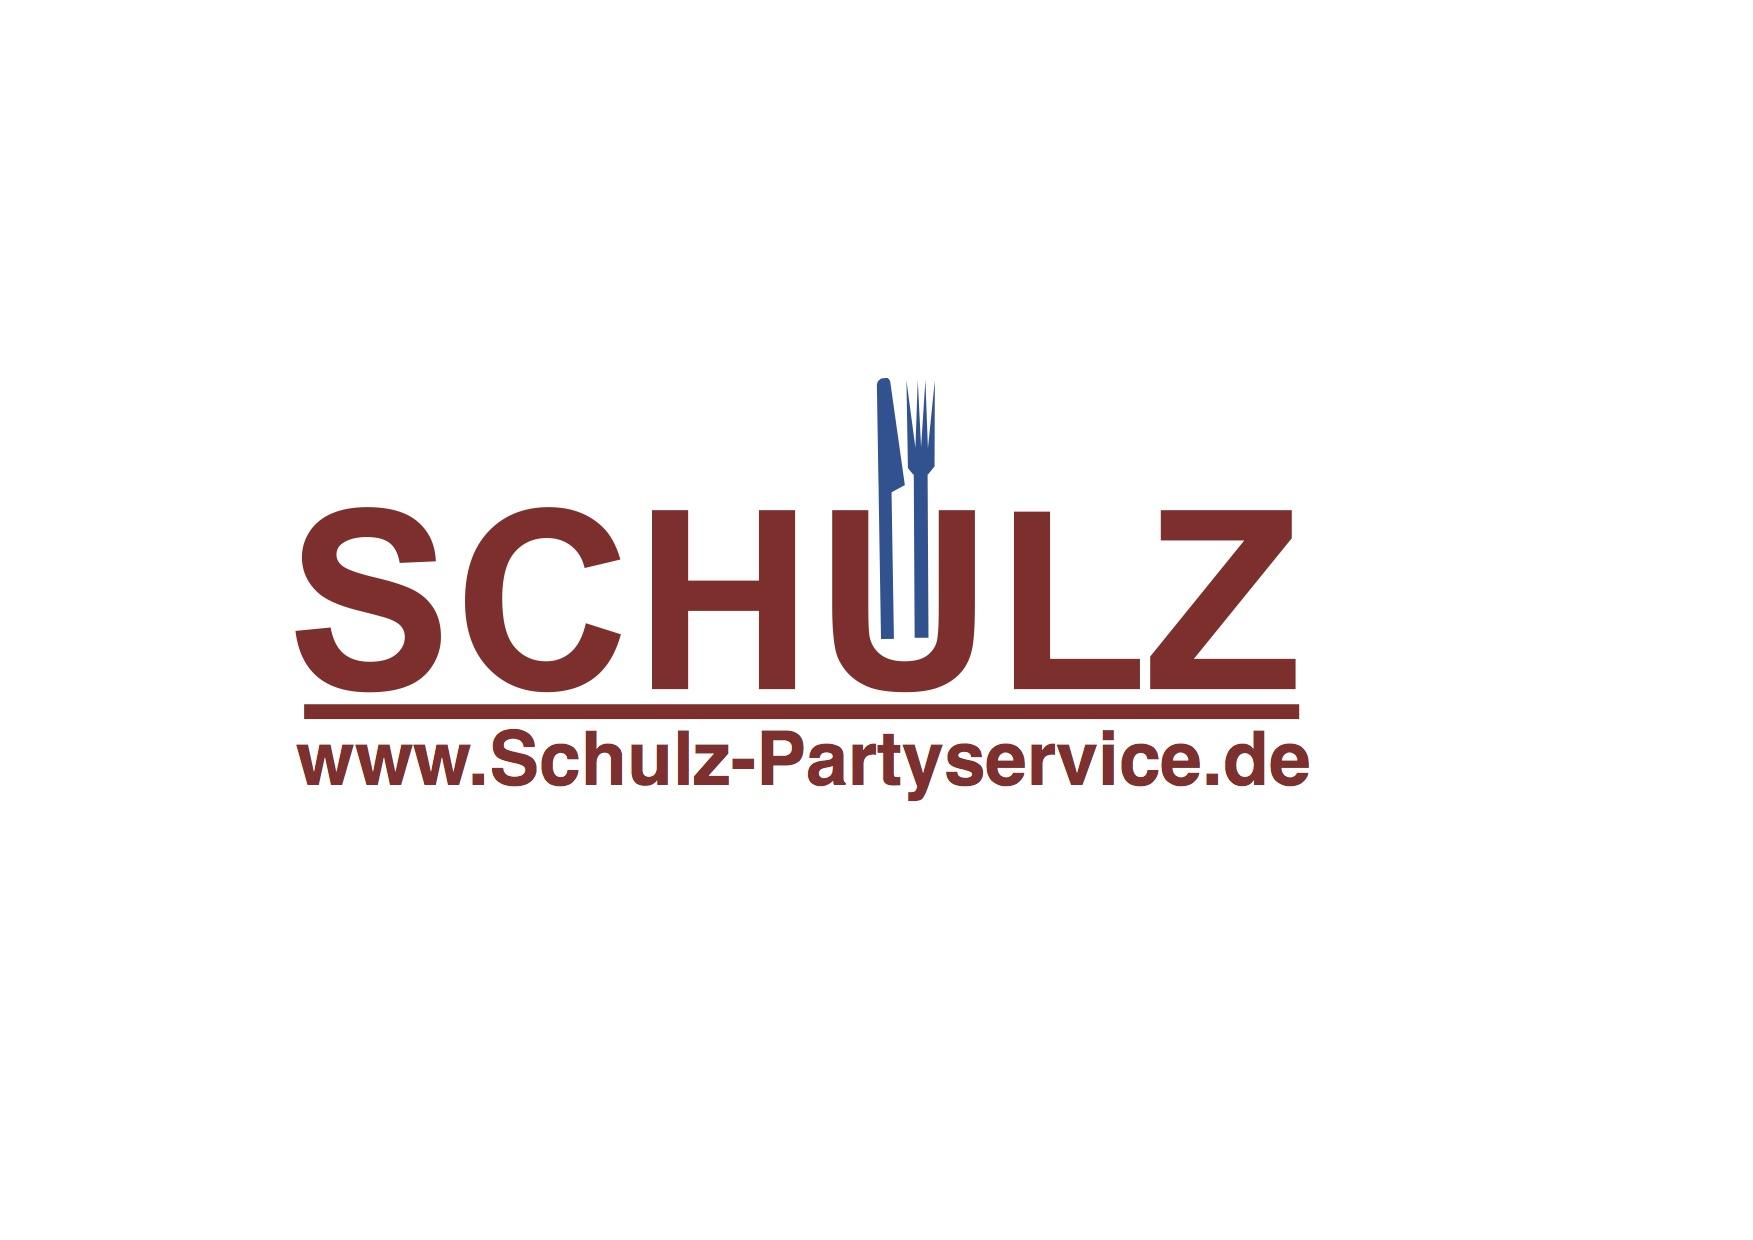 Partyservice Schulz